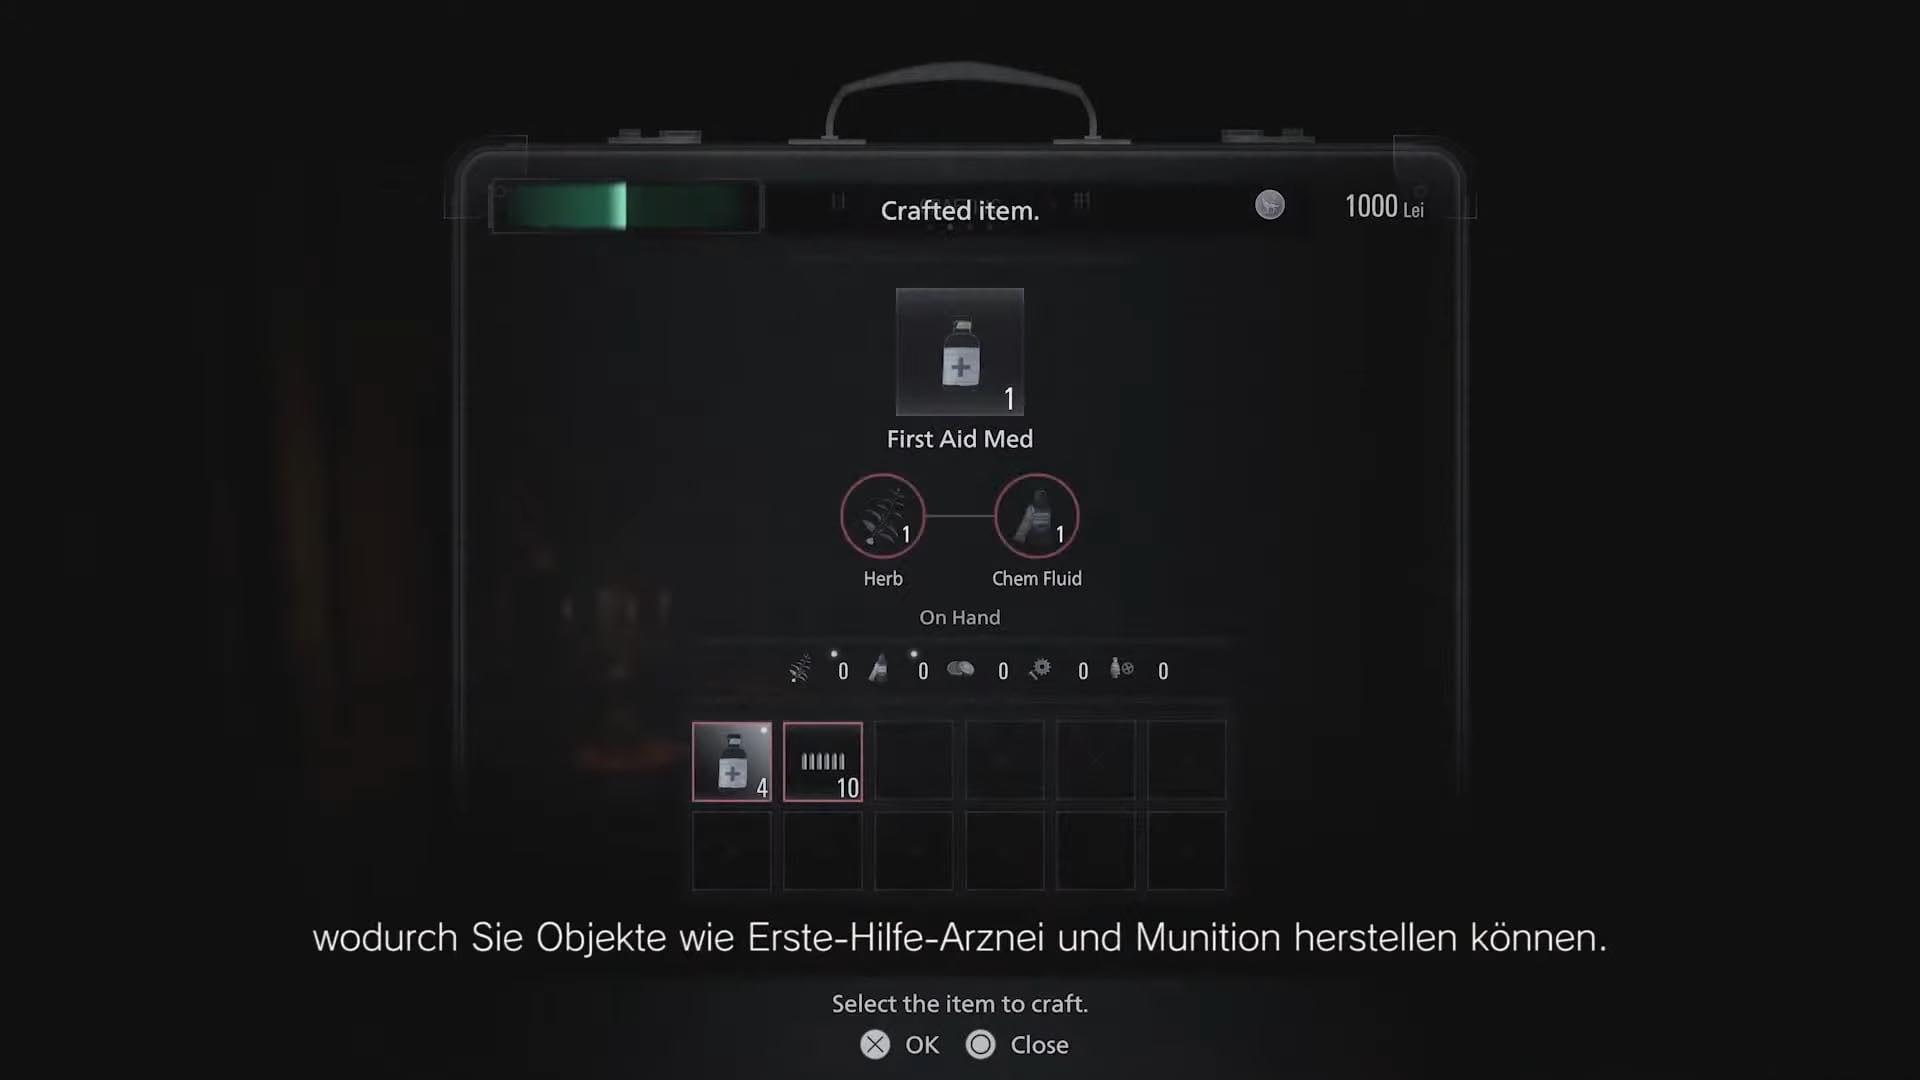 Resident Evil 8 - Inventarsystem und Crafting vereint